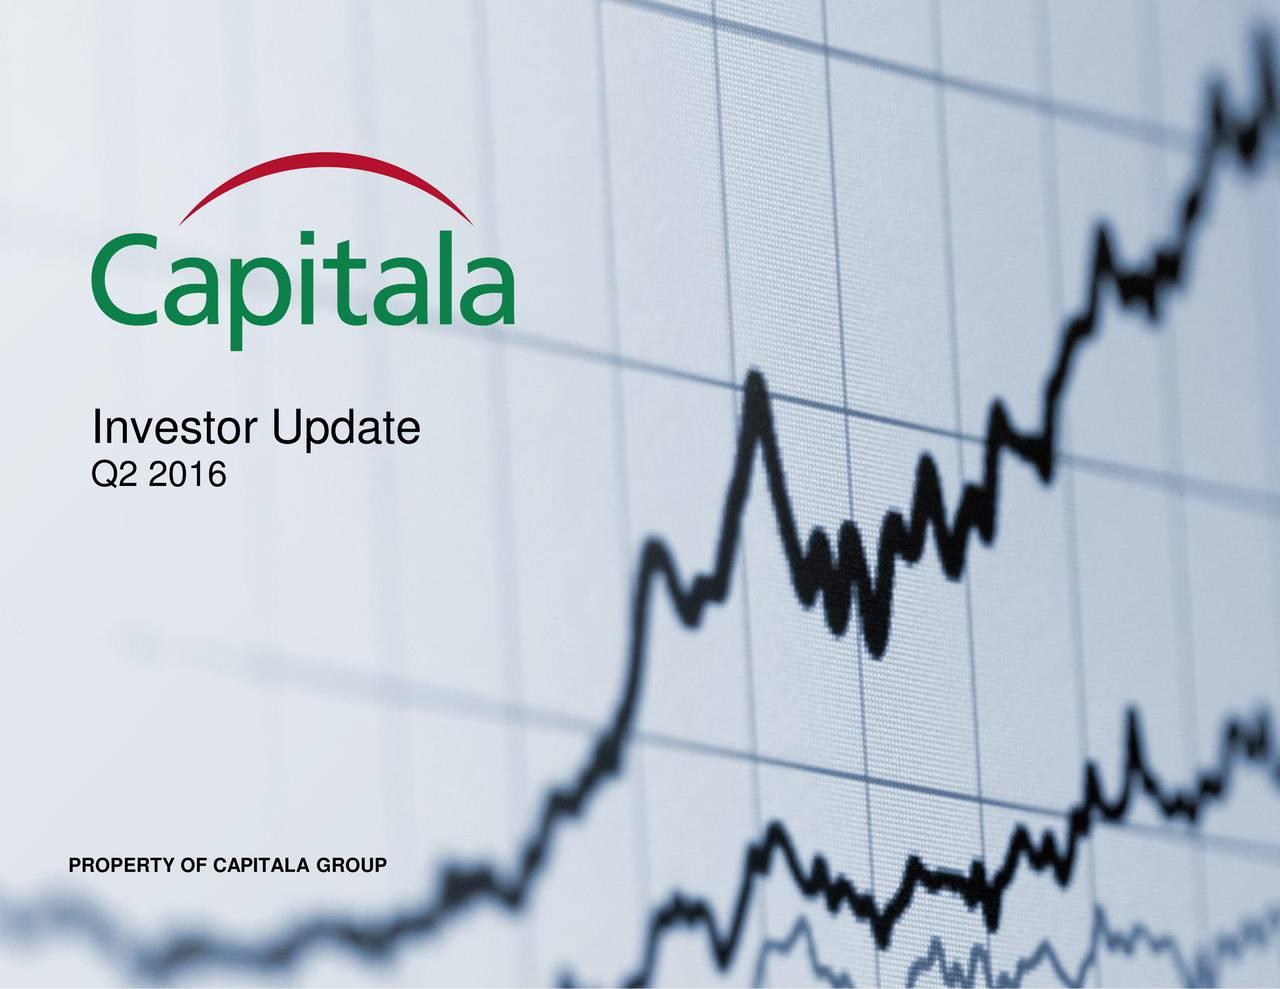 Q2 2016 PROPERTY OF CAPITALA GROUP